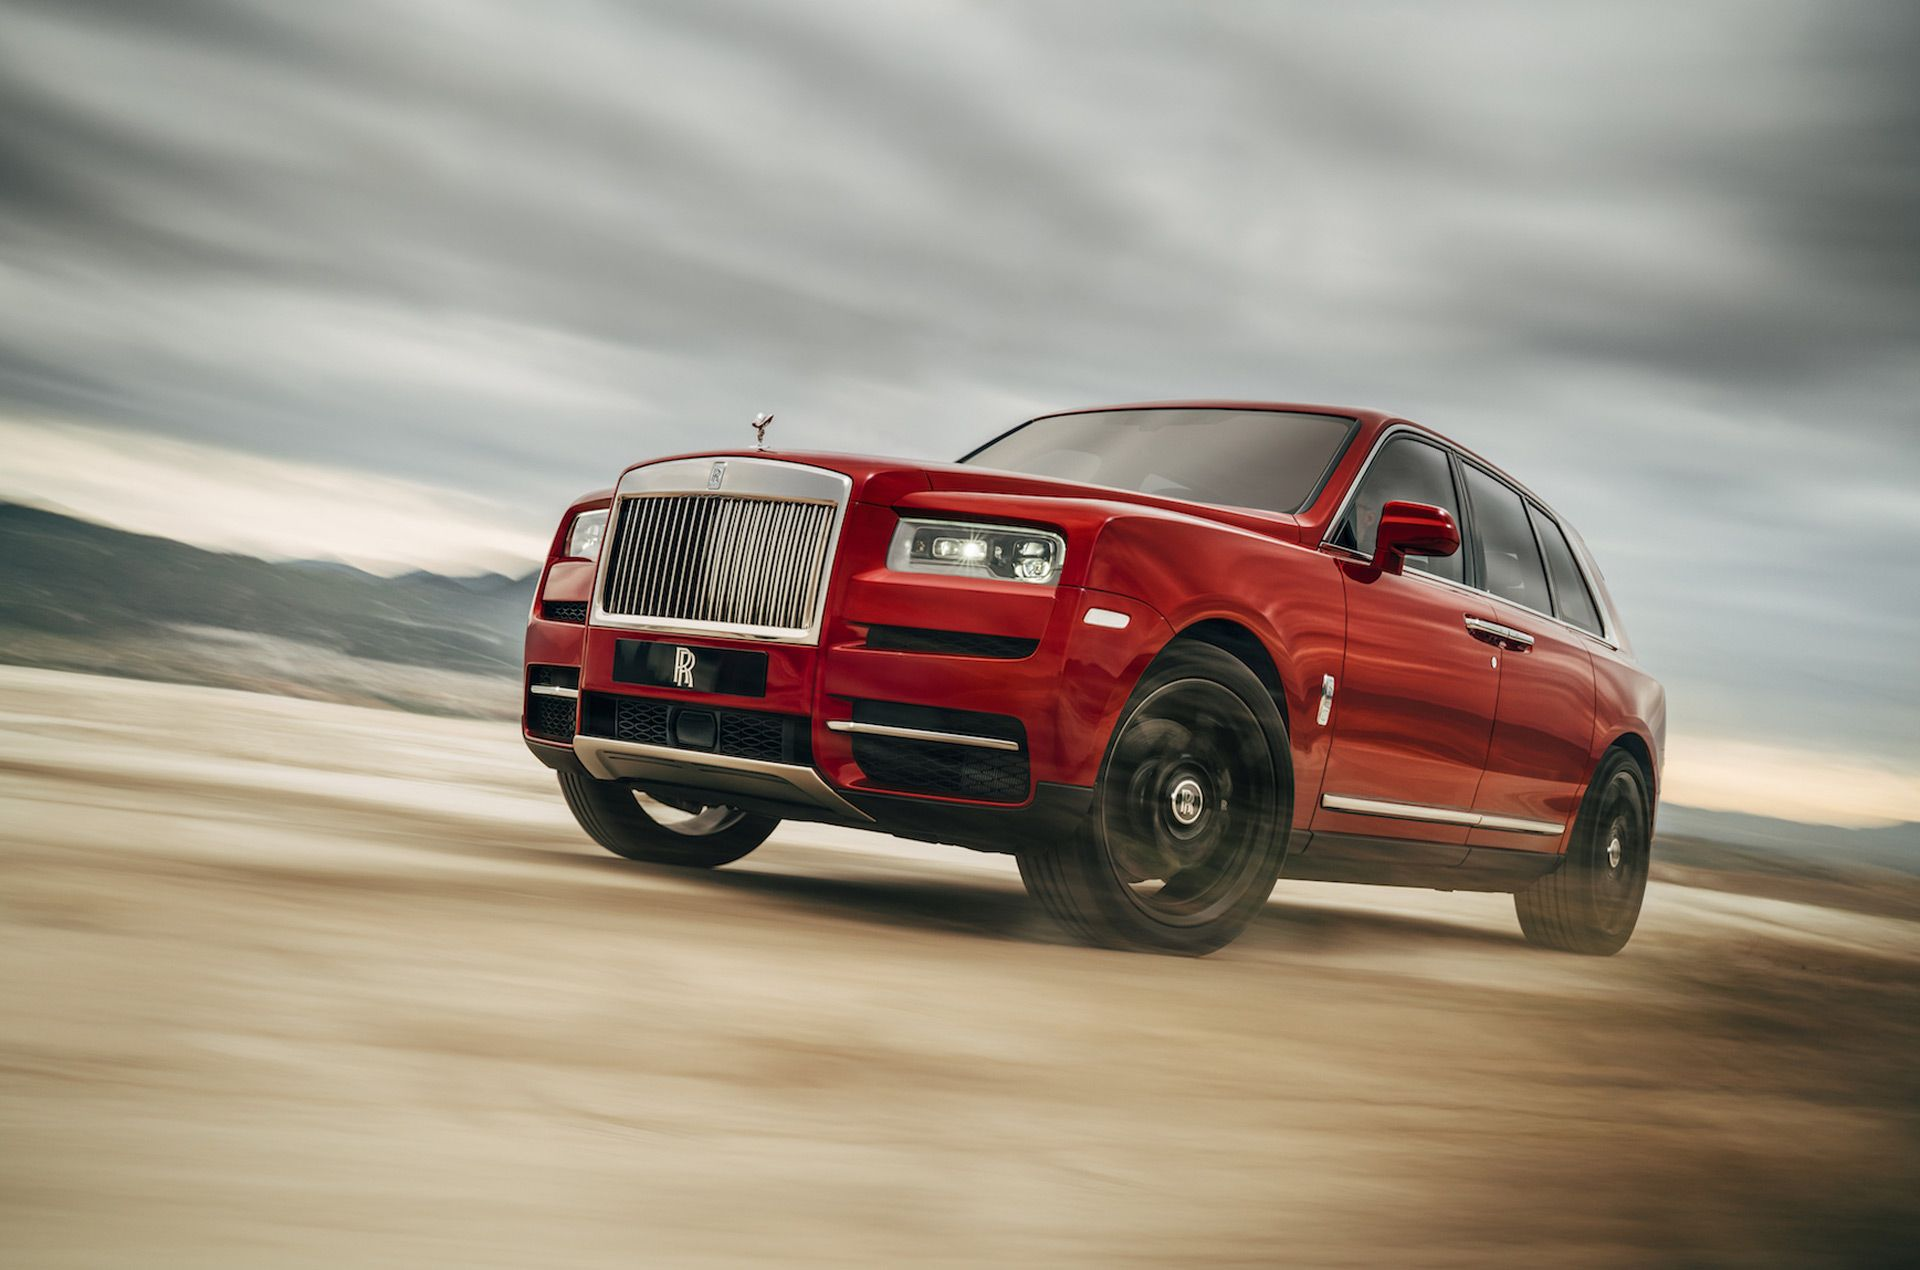 2019 Rolls Royce Cullinan ultra luxury SUV revealed